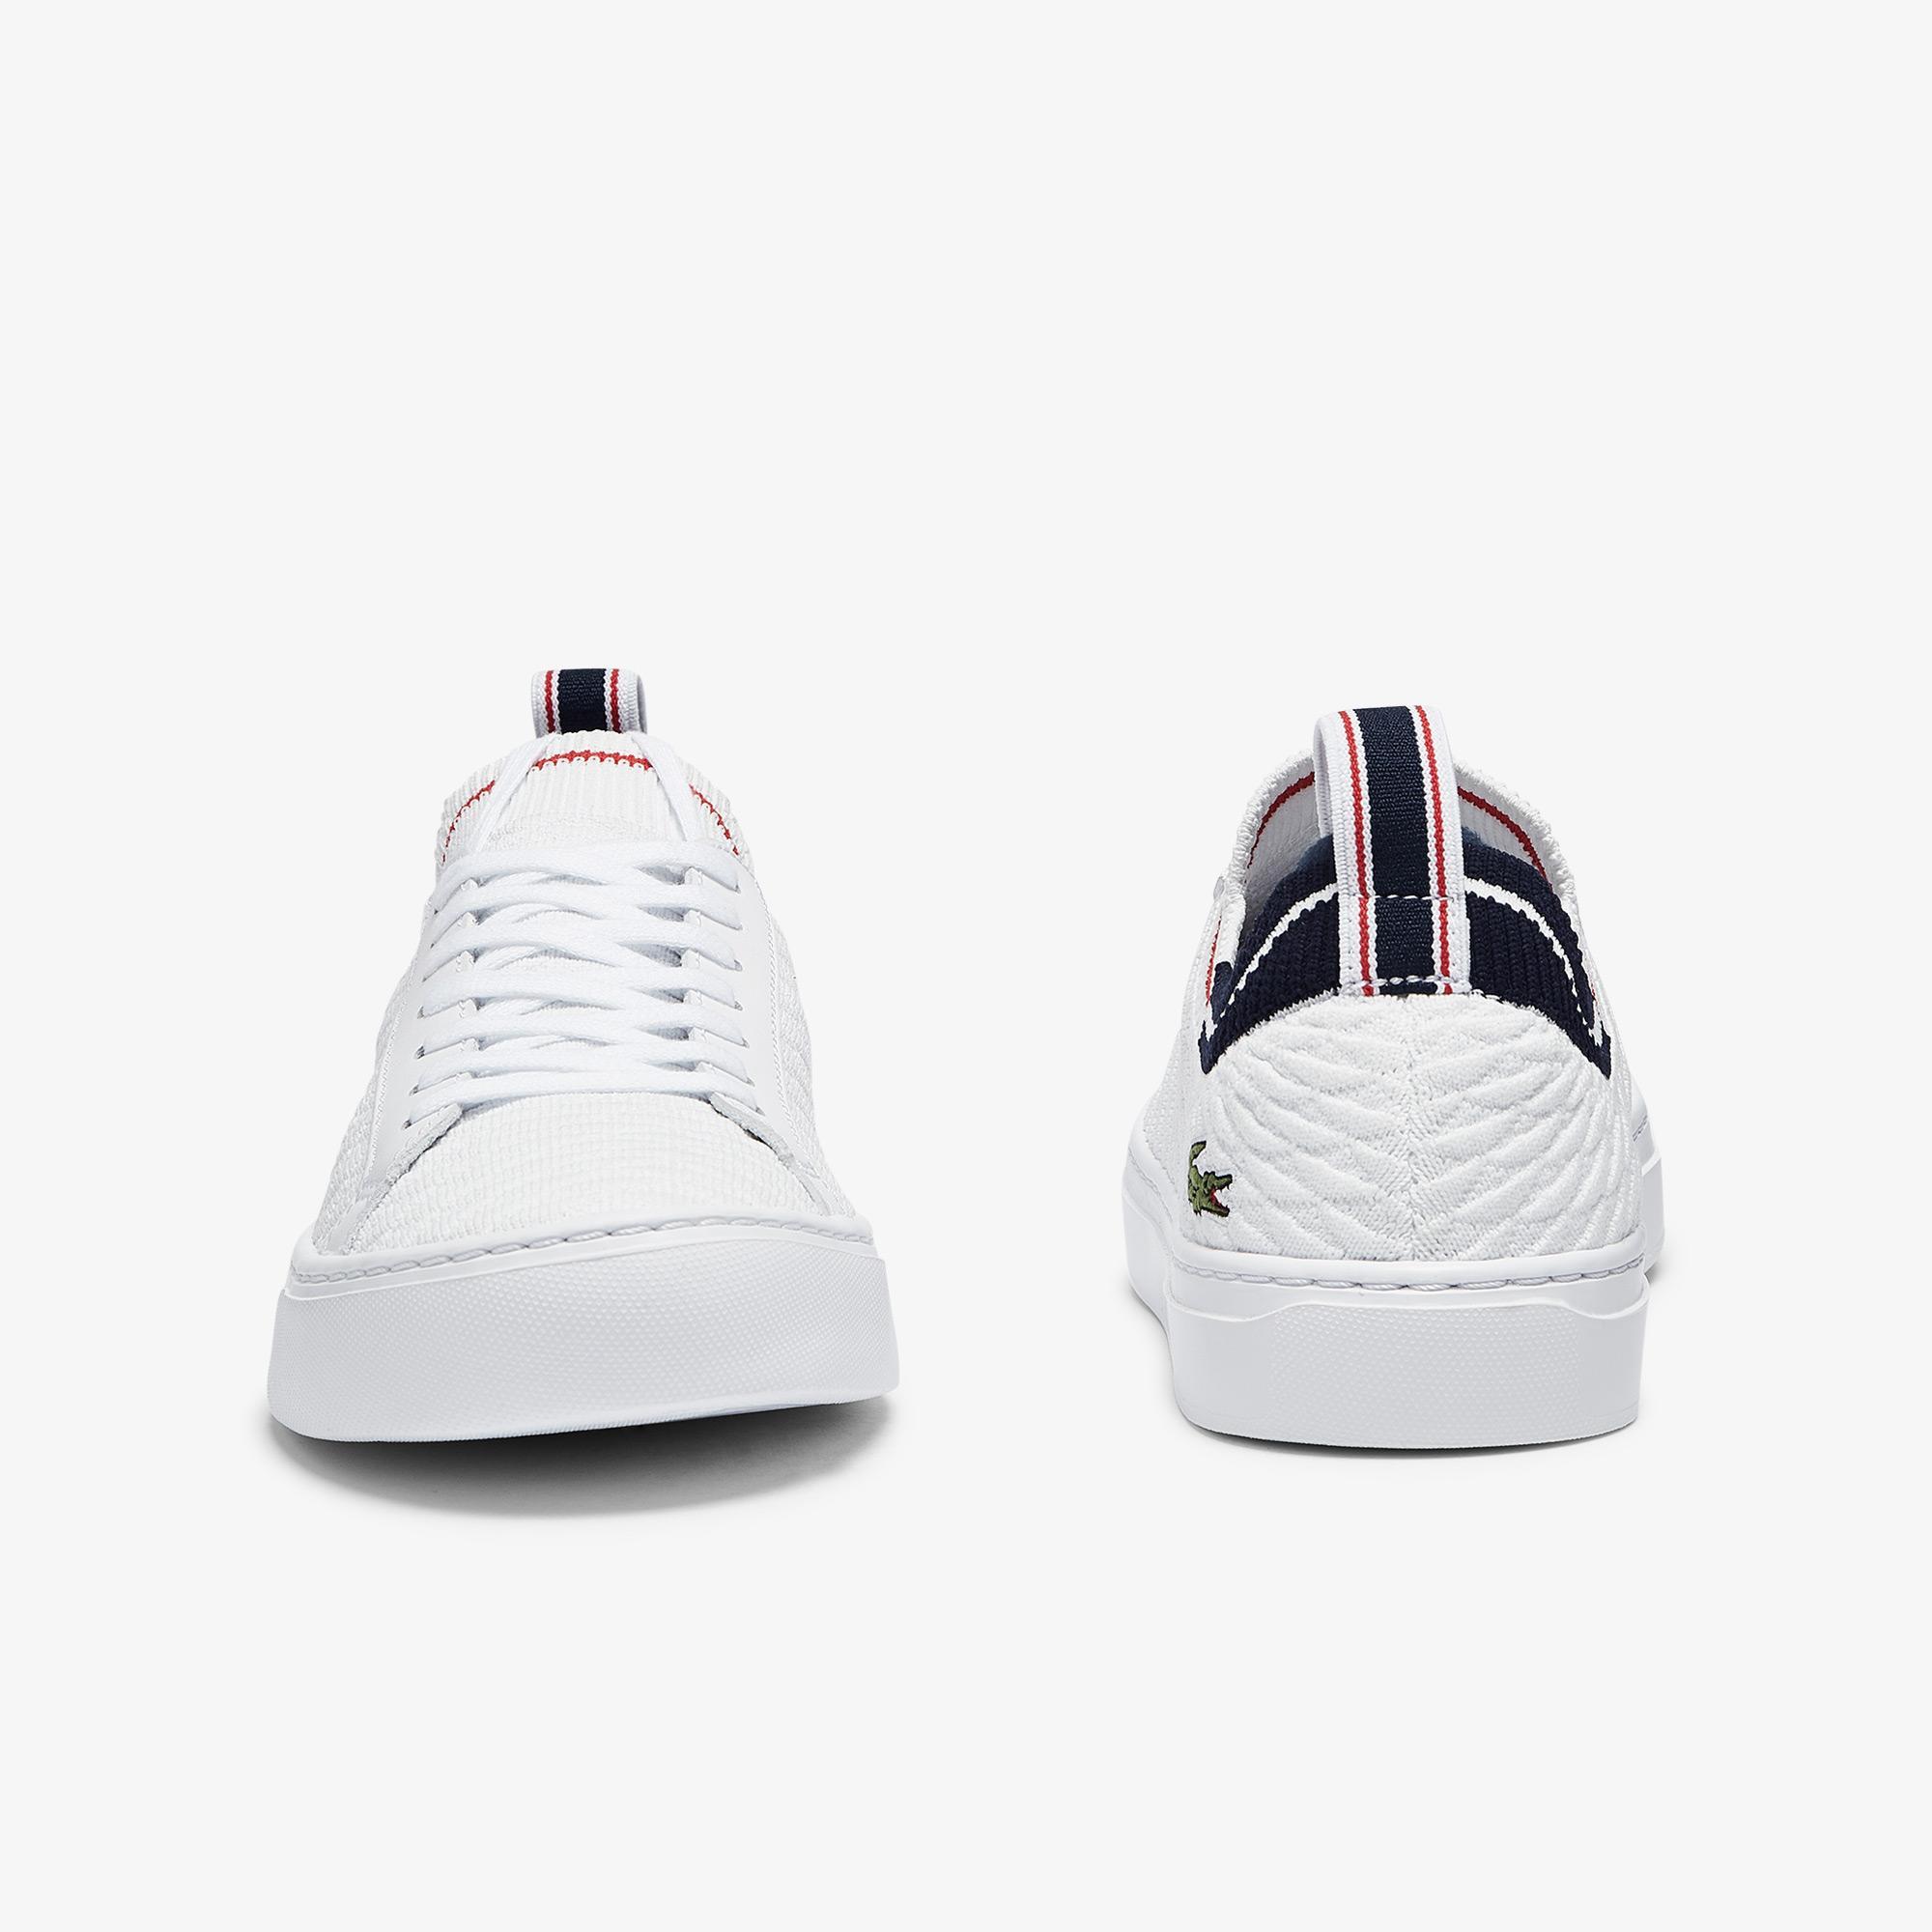 Lacoste La Piquee 0721 1 Cma Erkek Beyaz - Lacivert - Kırmızı Sneaker